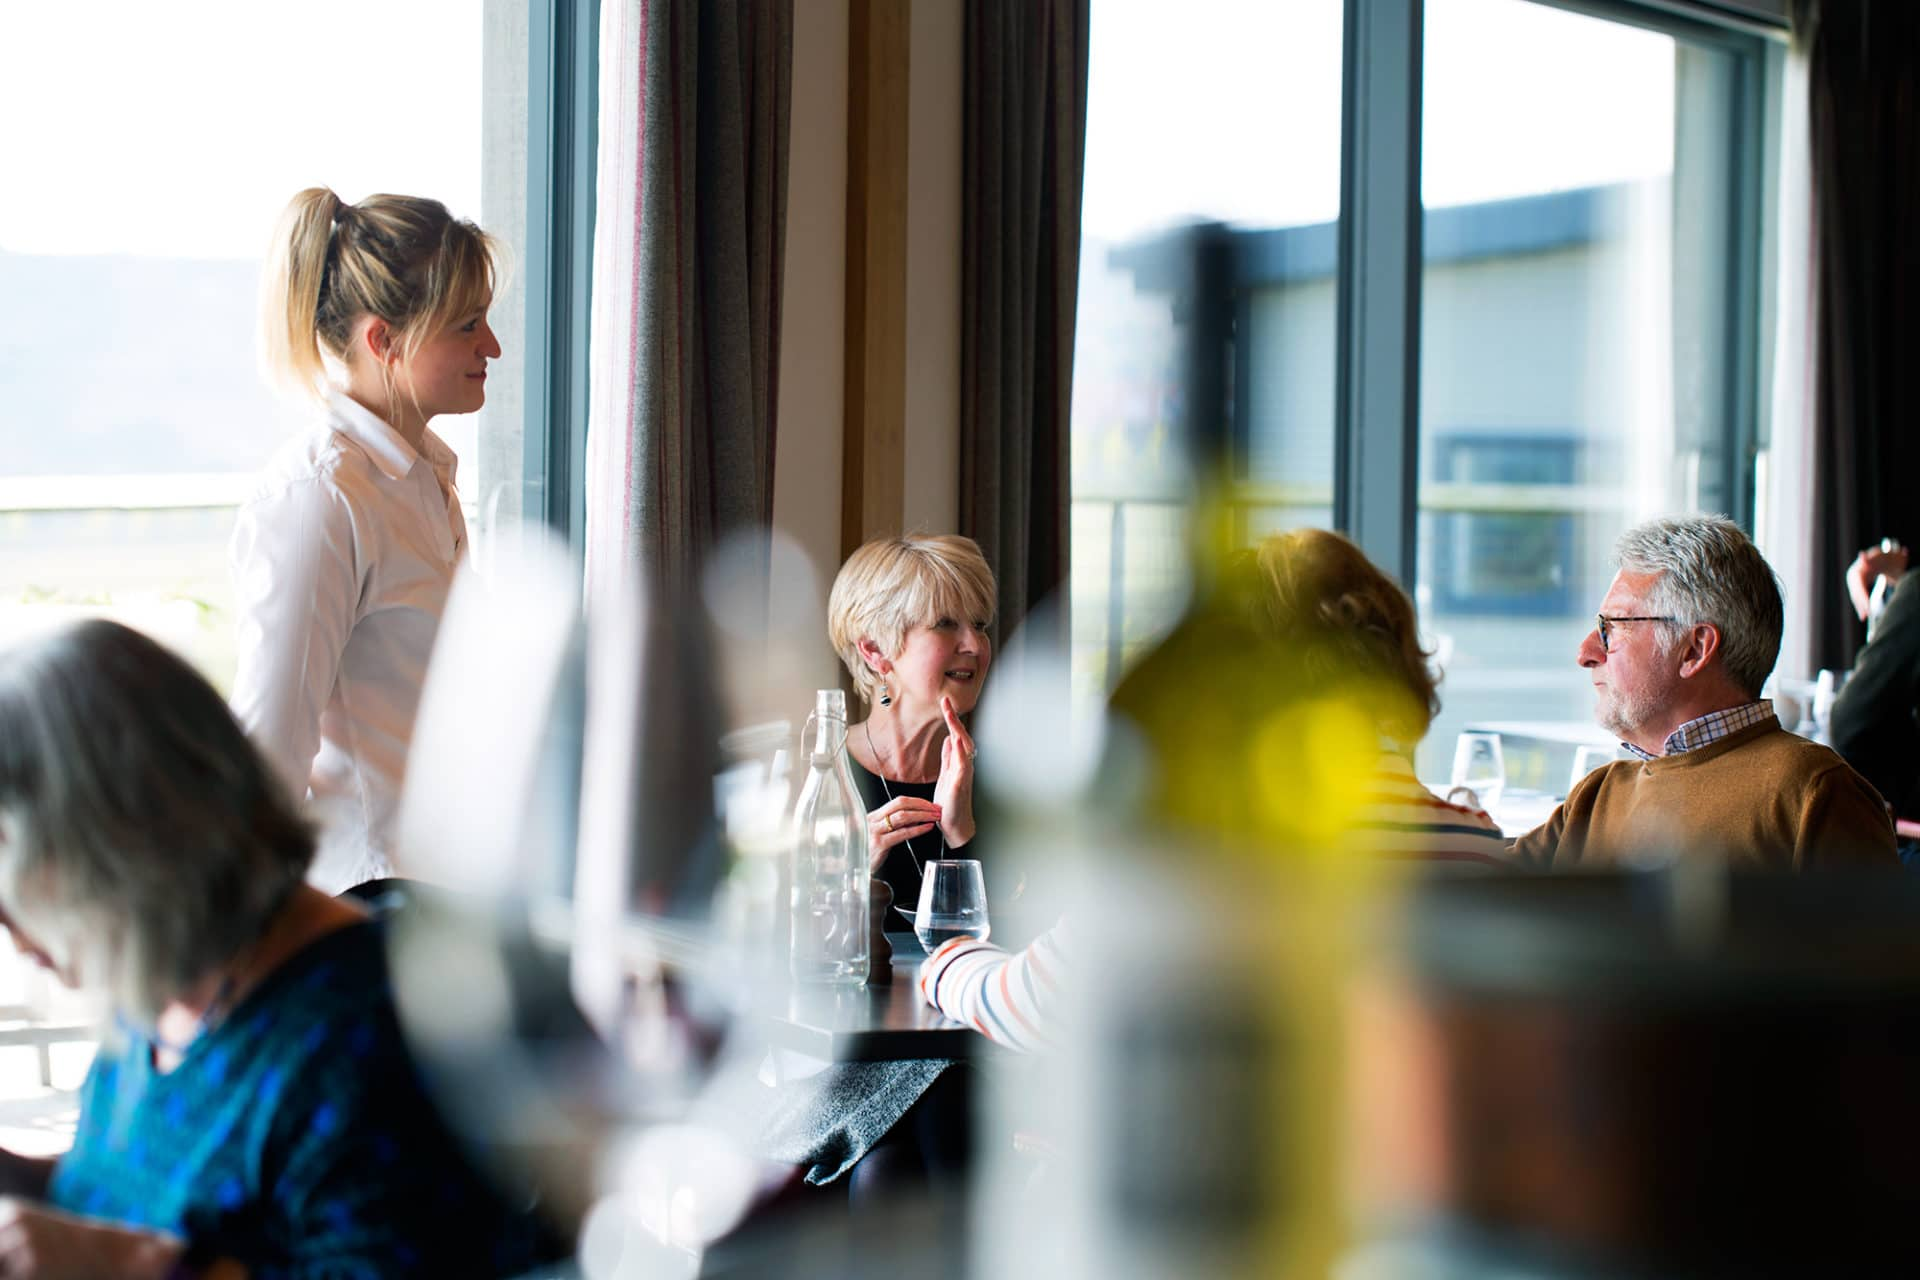 jobs in brighton, Rathfinny tasting room